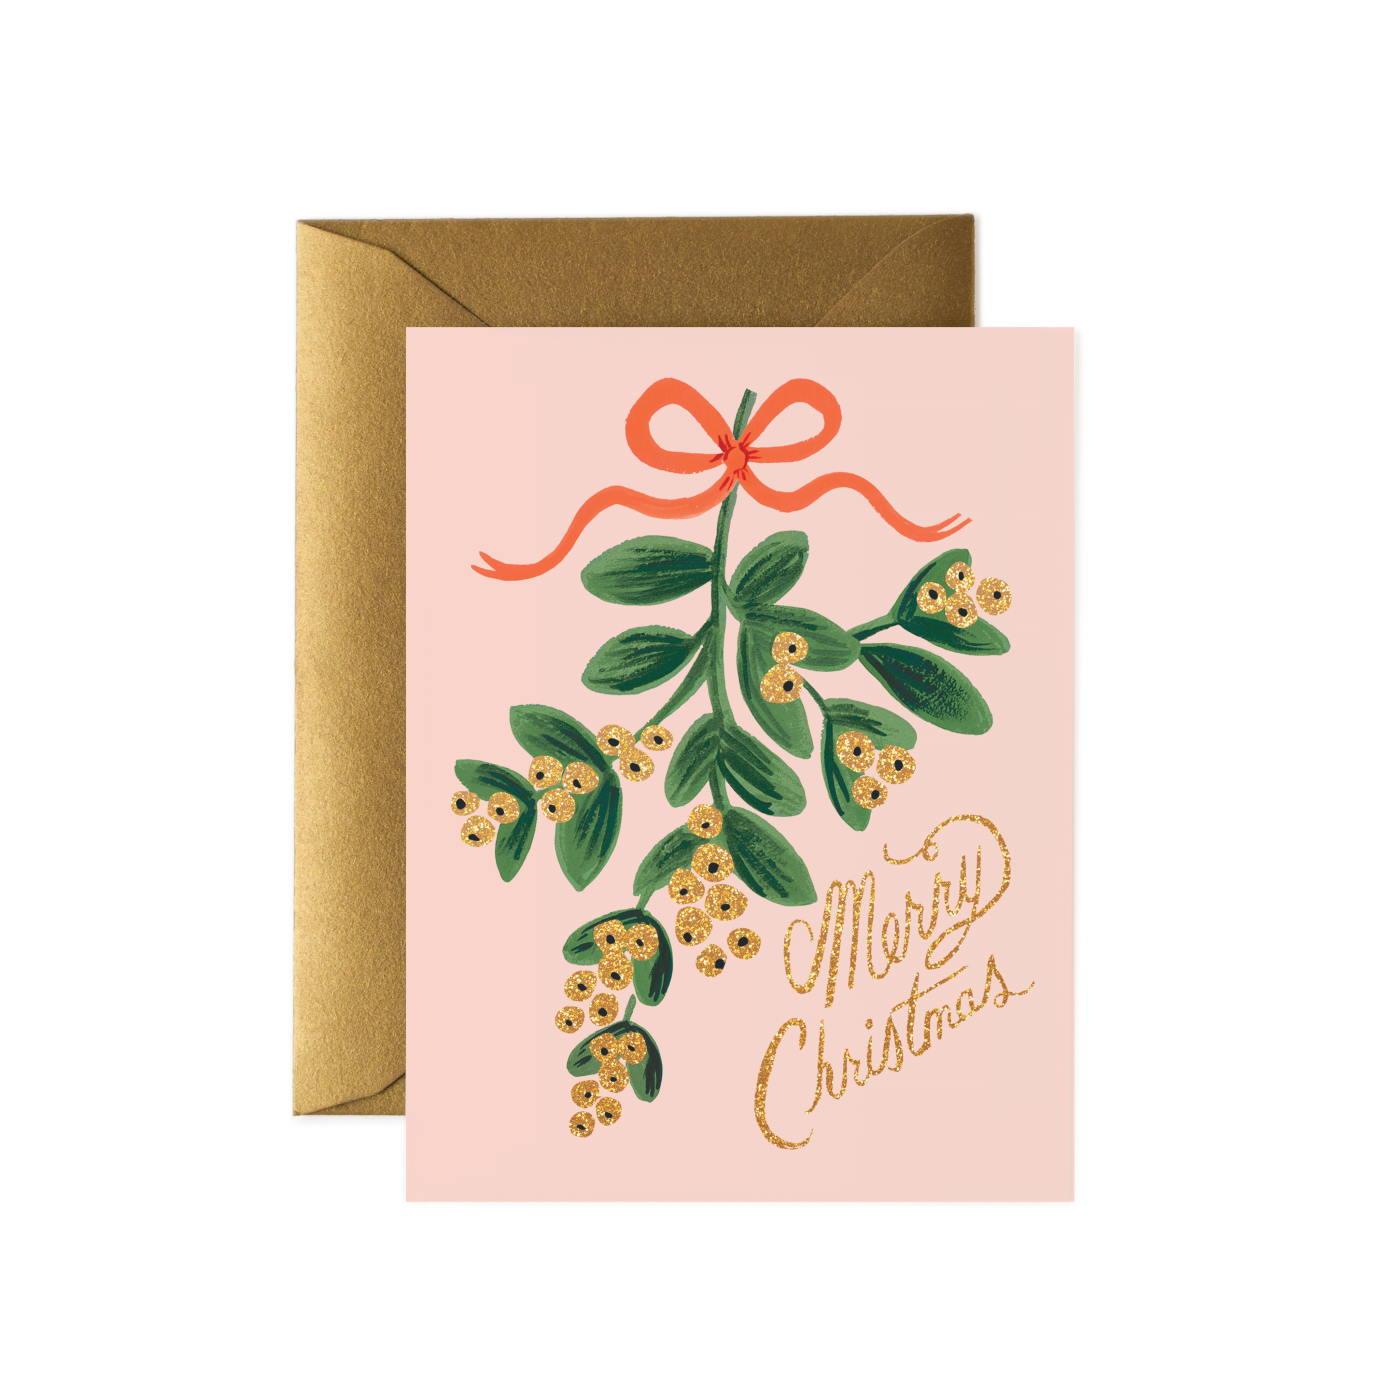 Julgåva Presentkort 1 450 kr